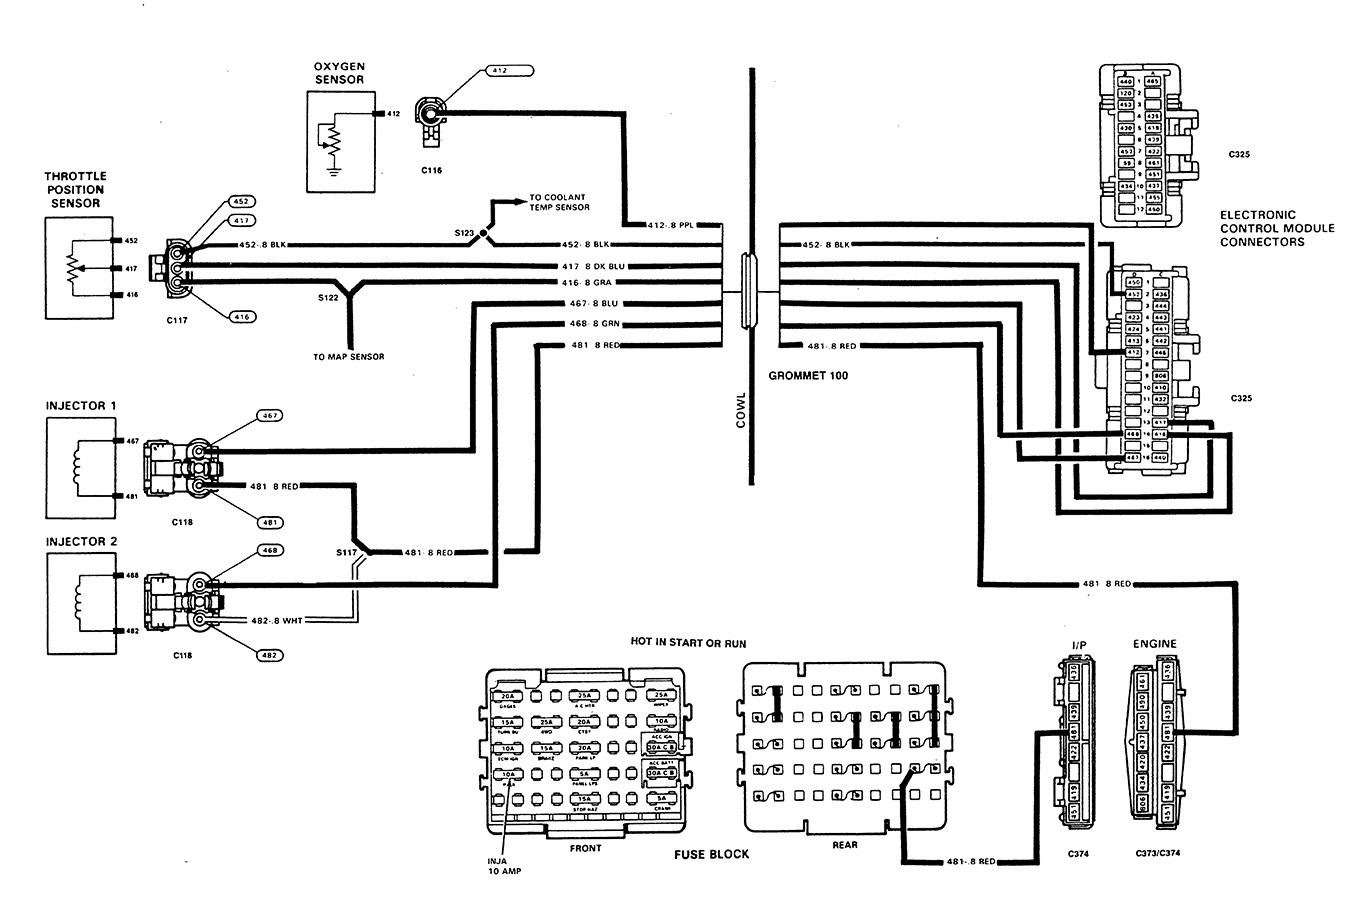 Bosch Oxygen Sensor Wire Diagram | Wiring Library - 4 Wire O2 Sensor Wiring Diagram